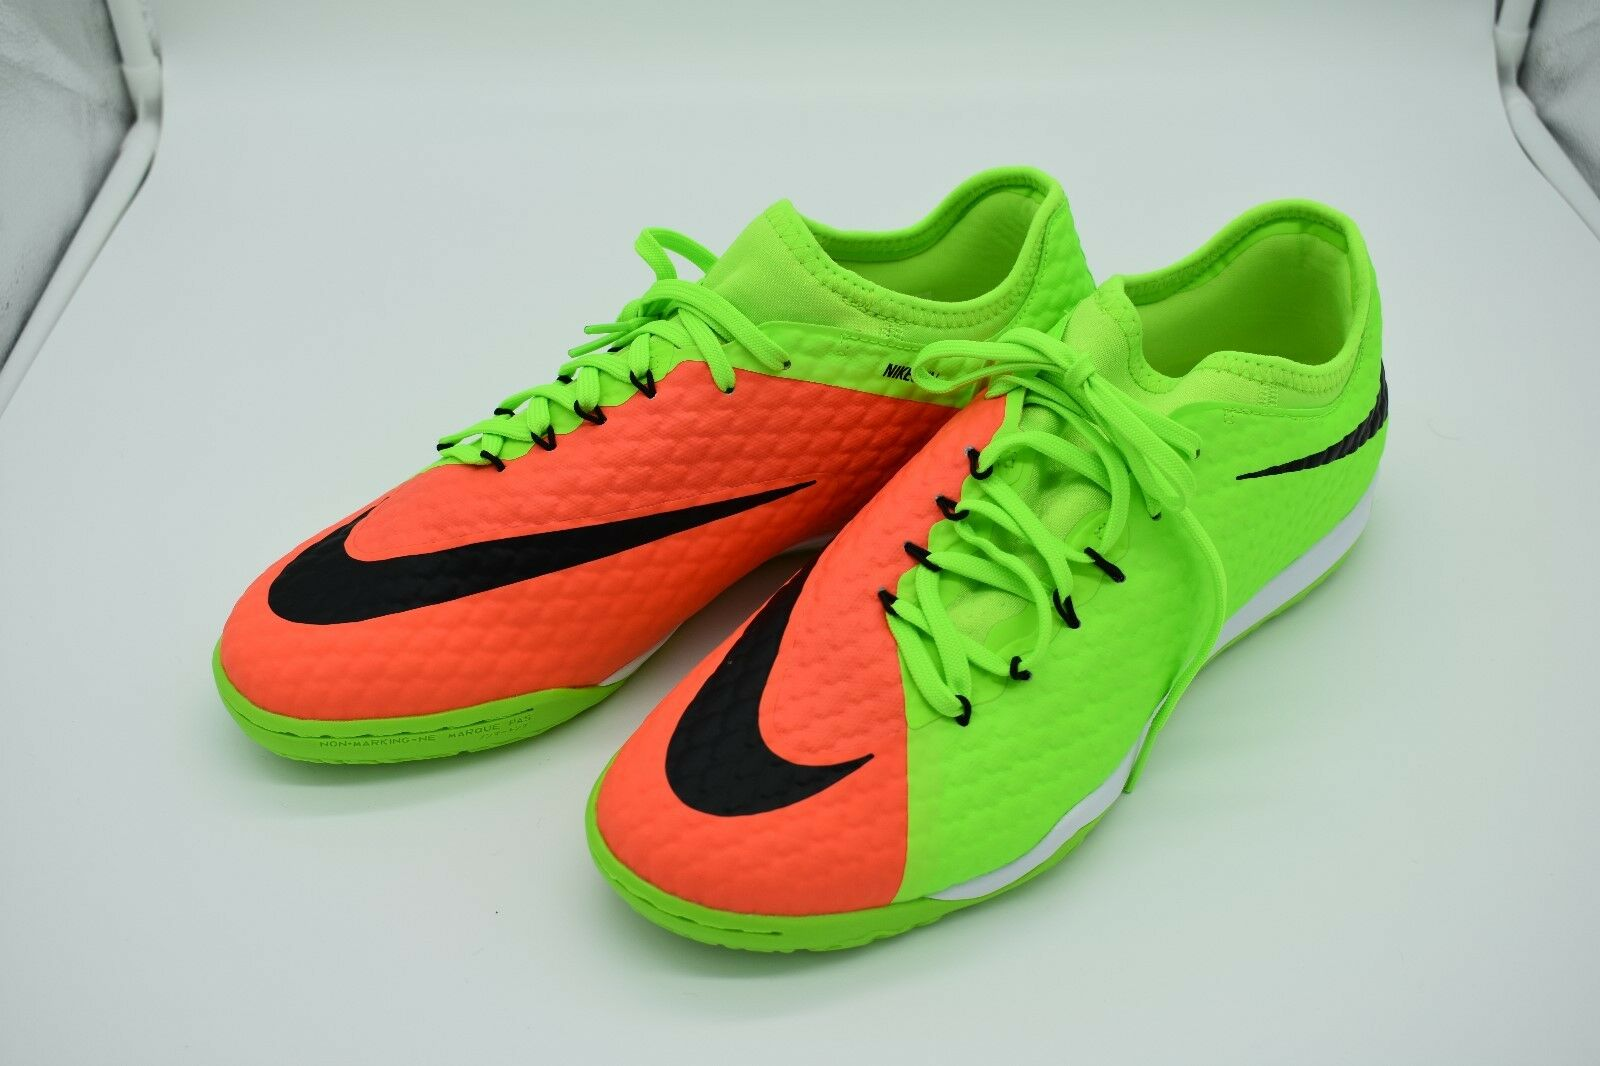 nike hypervenomx hypervenomx nike final ii ic les chaussures 852572-308 soccer int 758869